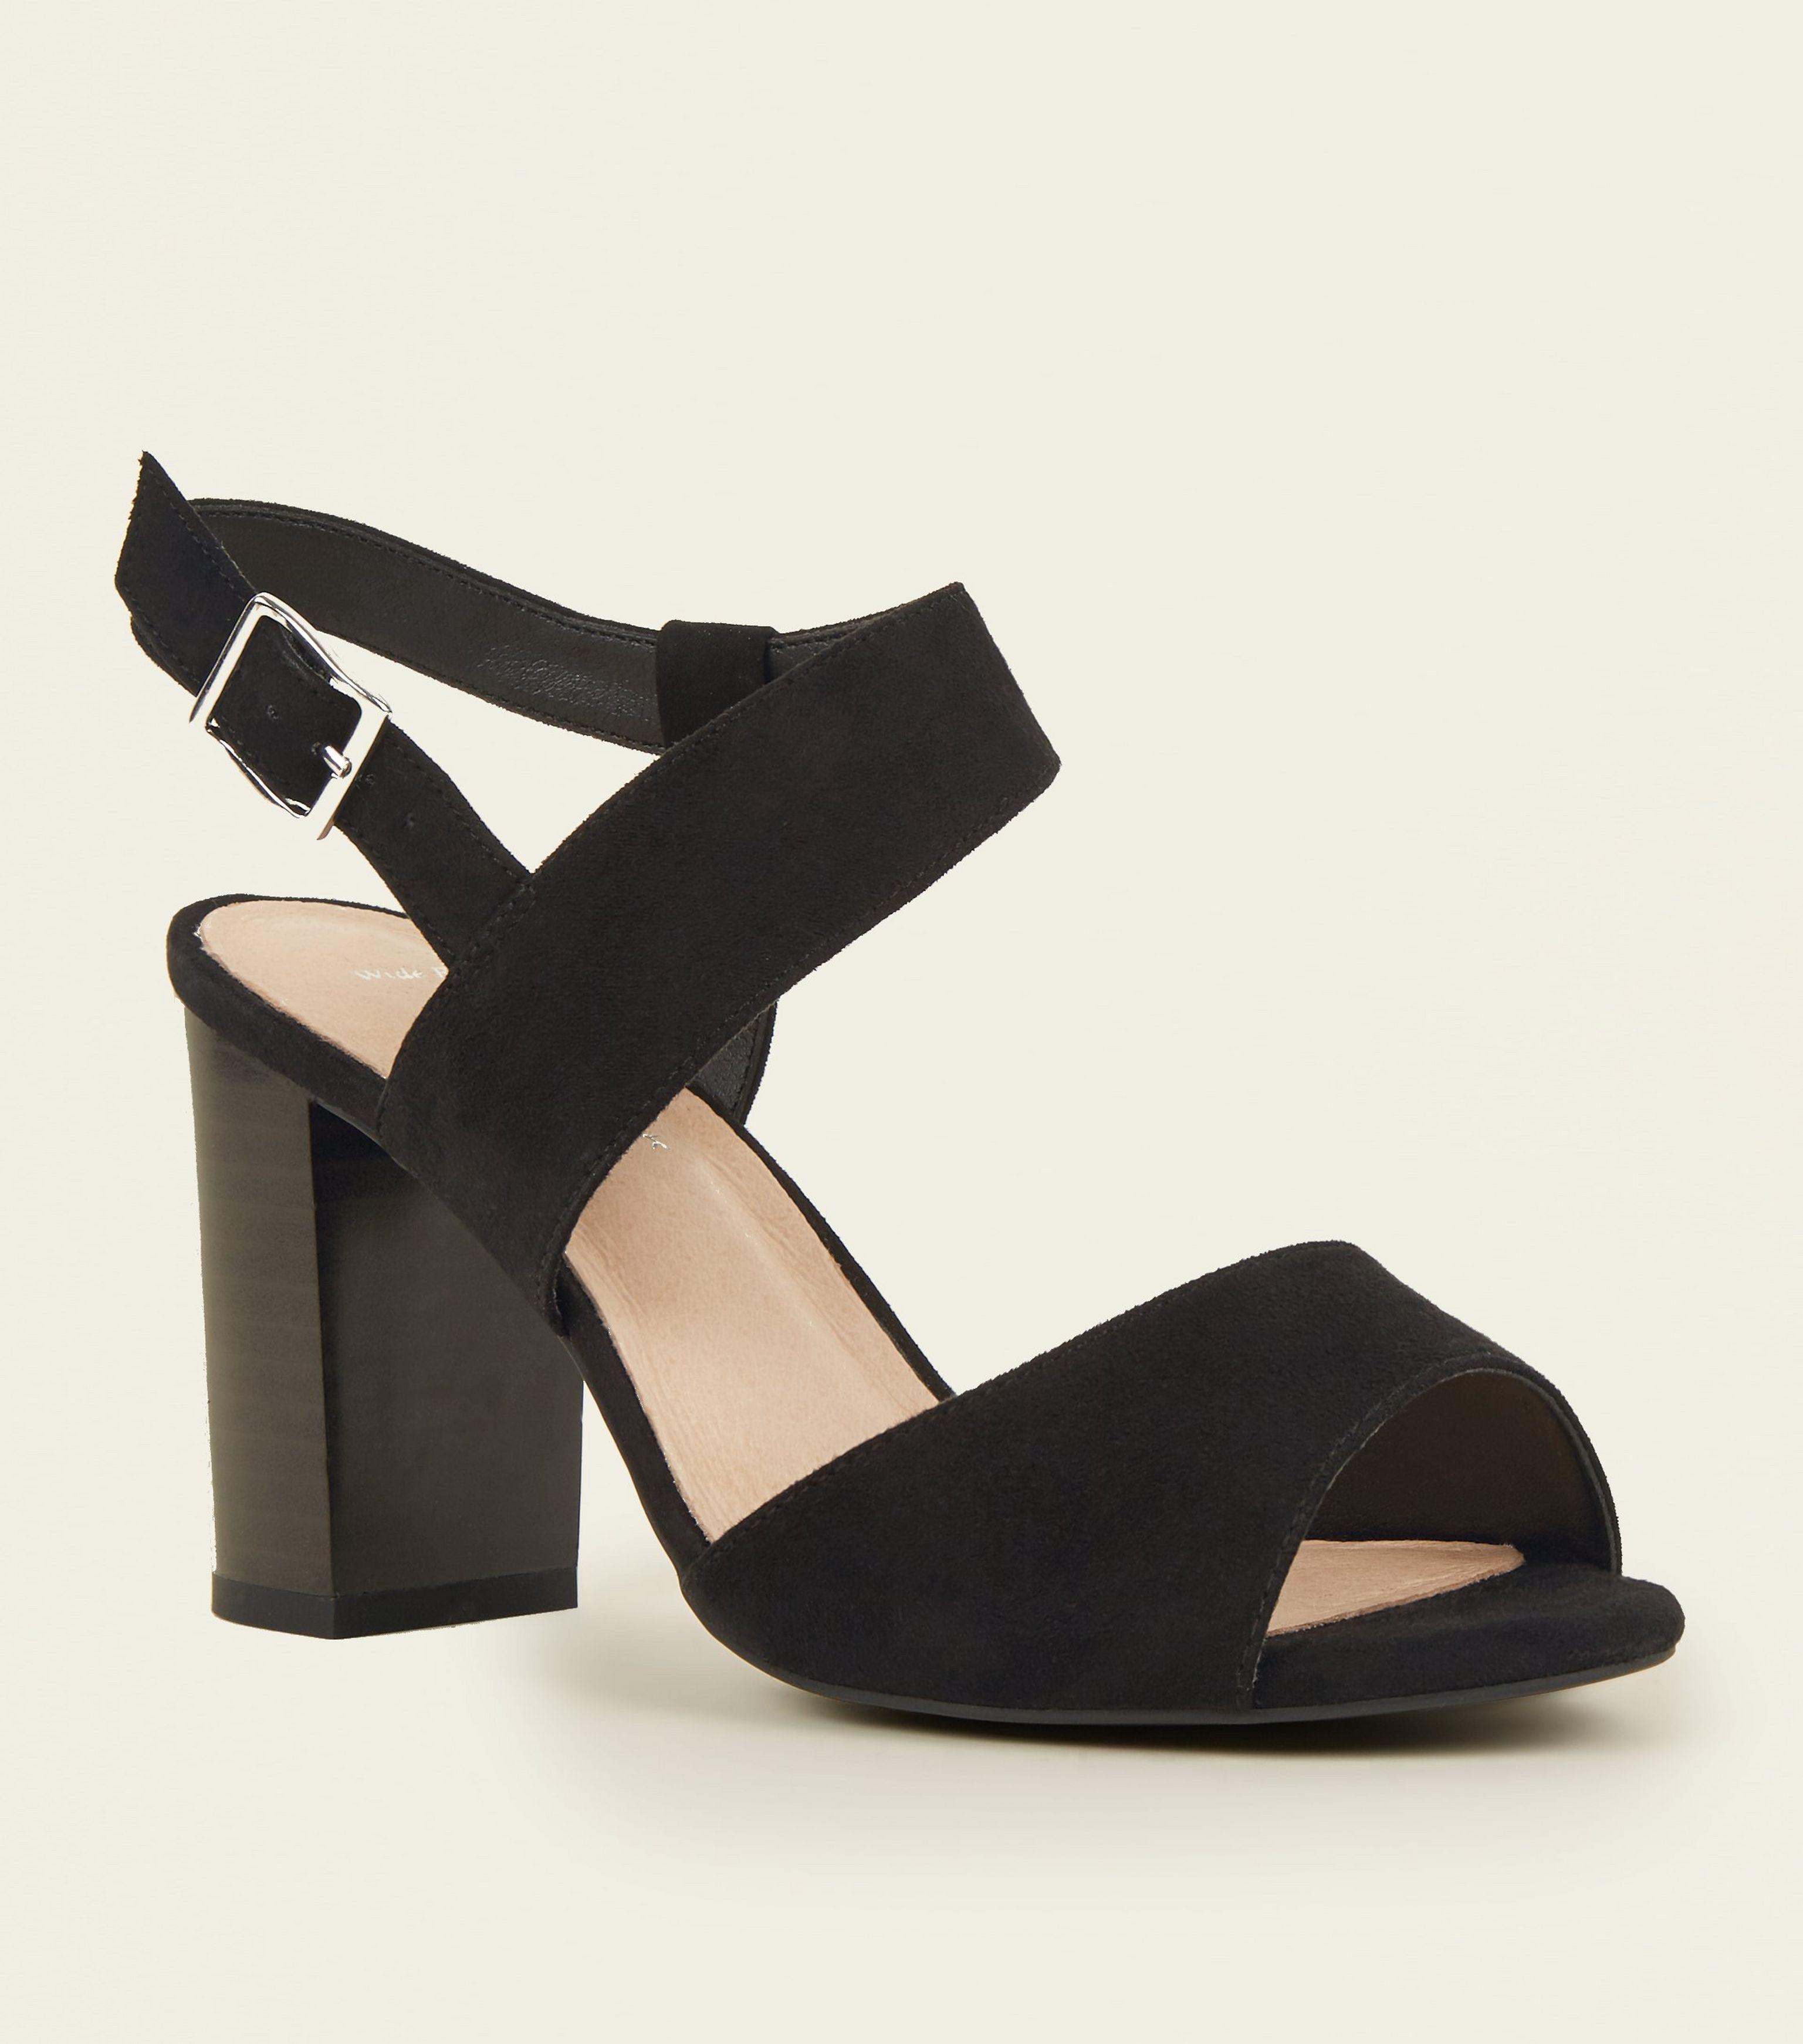 25f17e60d8b New Look Wide Fit Black Comfort Flex Suedette Asymmetric Heeled ...